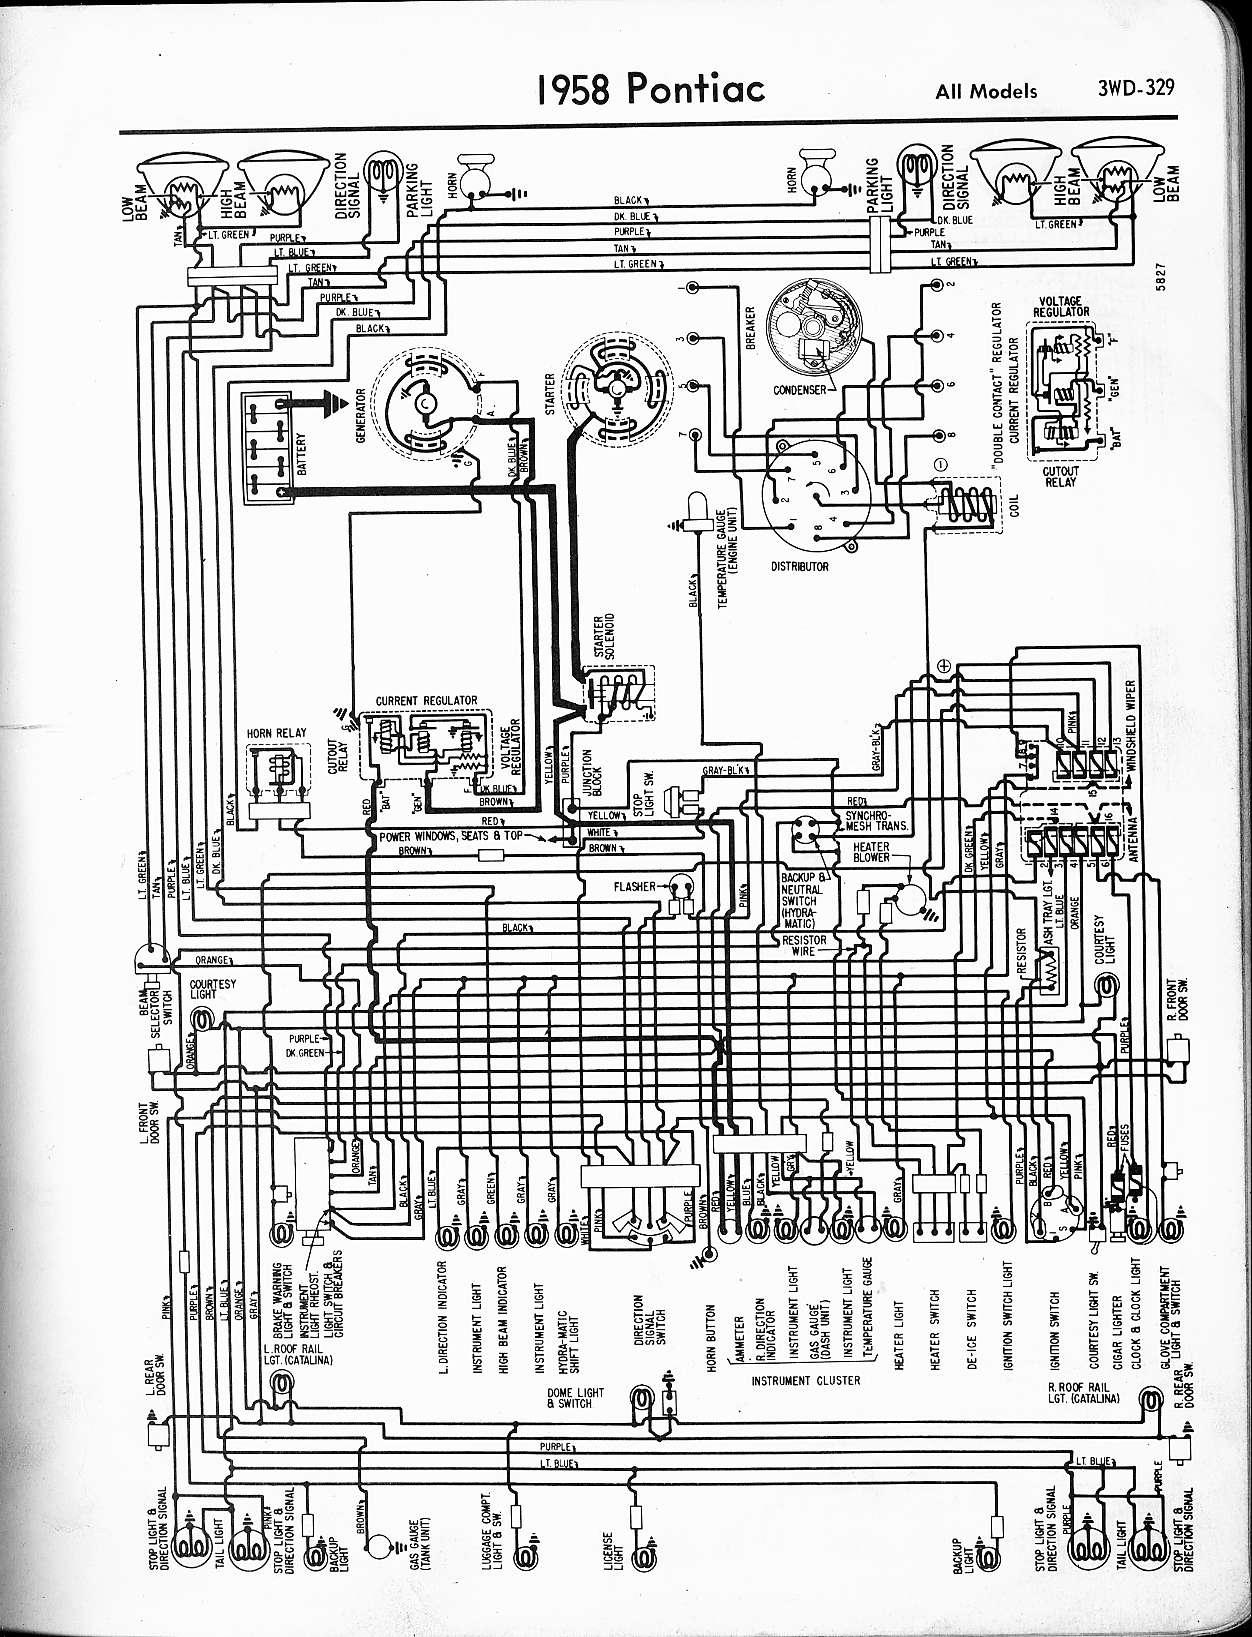 Marvelous Wiring Diagram For 1959 Buick All Models Basic Electronics Wiring Wiring Cloud Cranvenetmohammedshrineorg